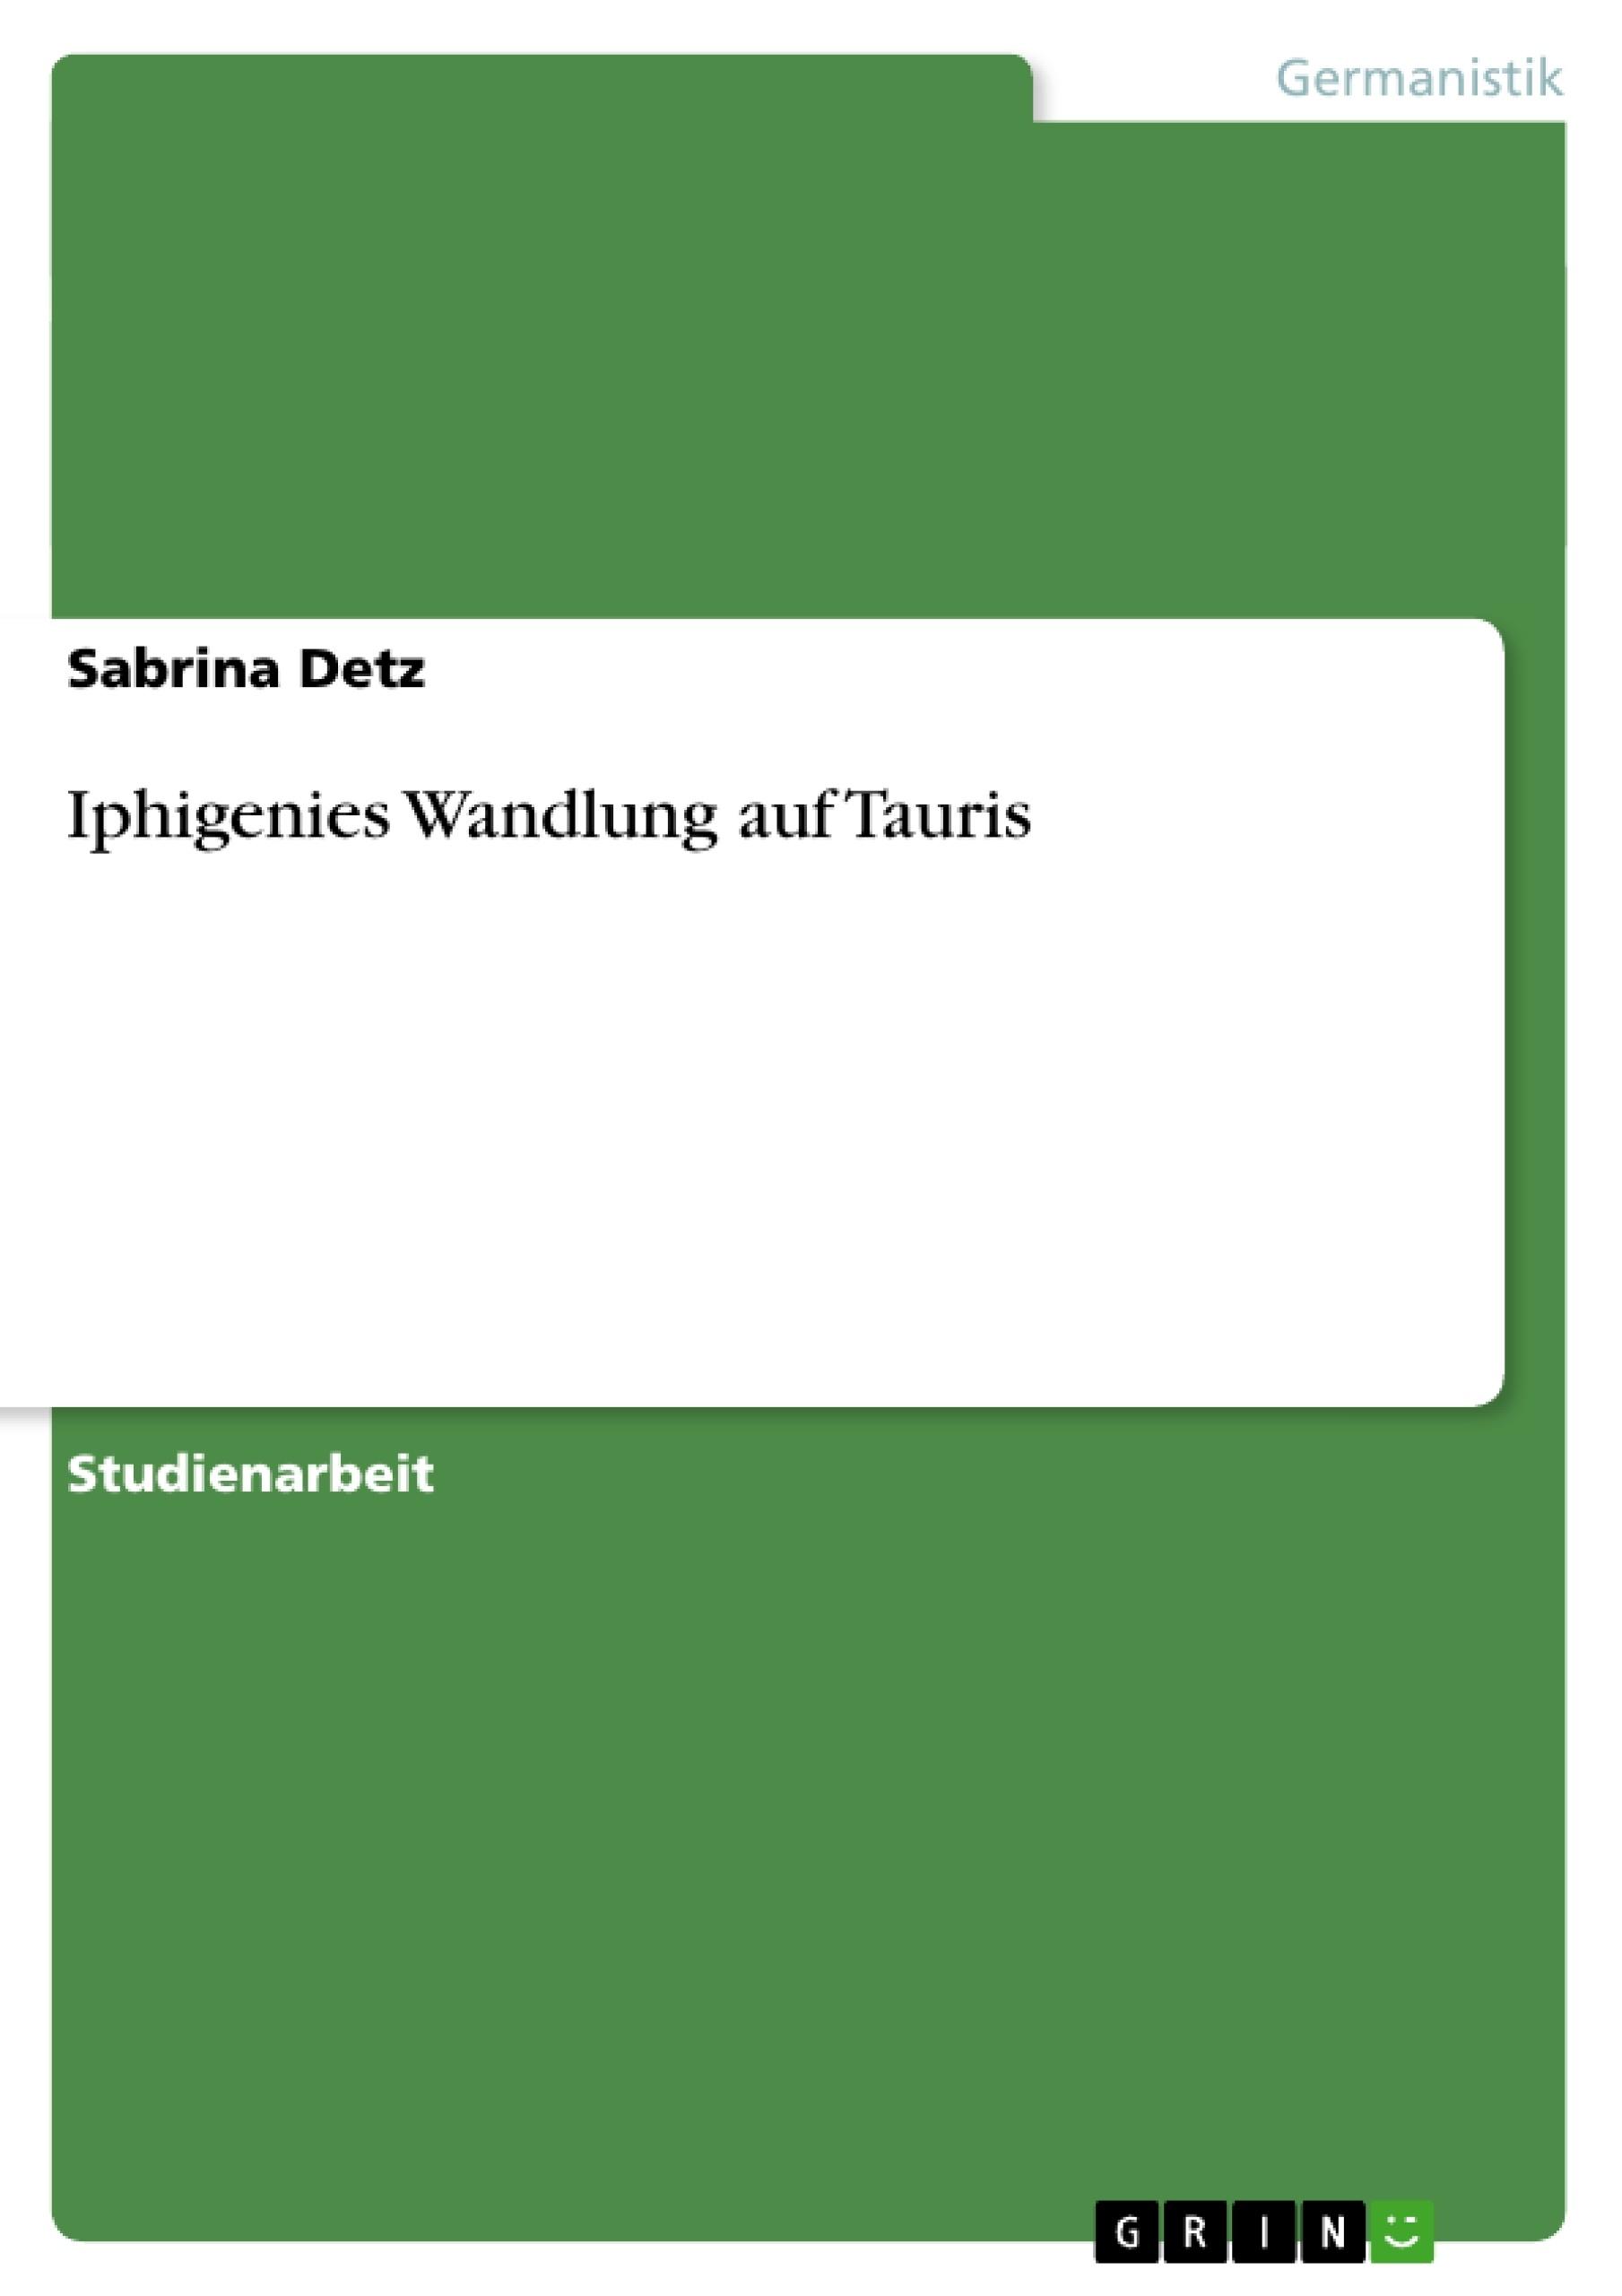 Titel: Iphigenies Wandlung auf Tauris